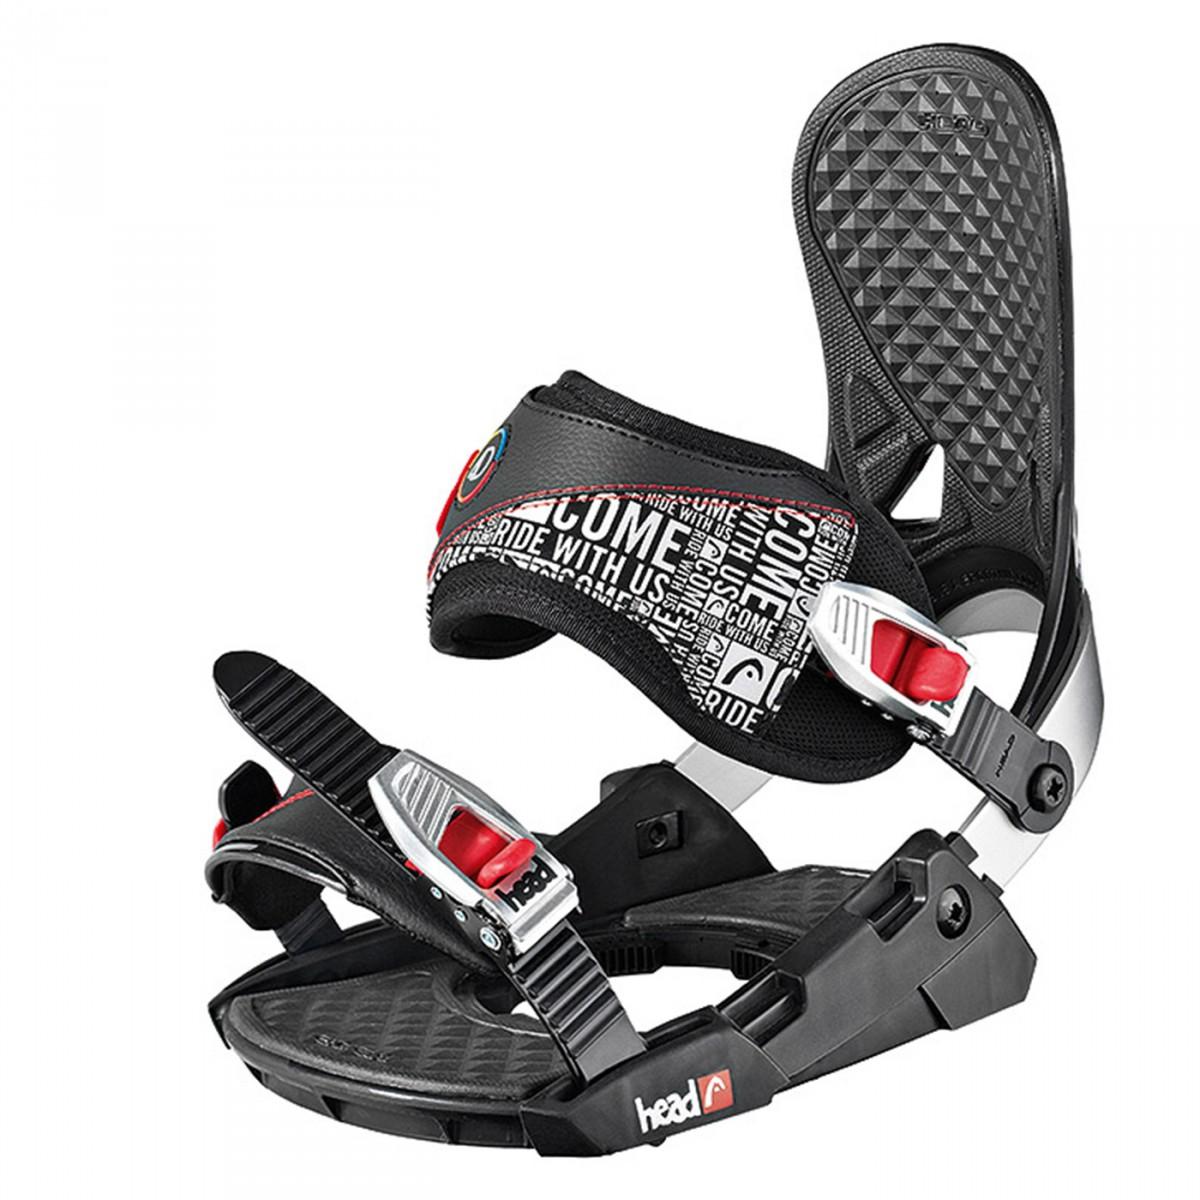 Snowboard Bindings Head P Three 4d Speed Disc -Snowboard